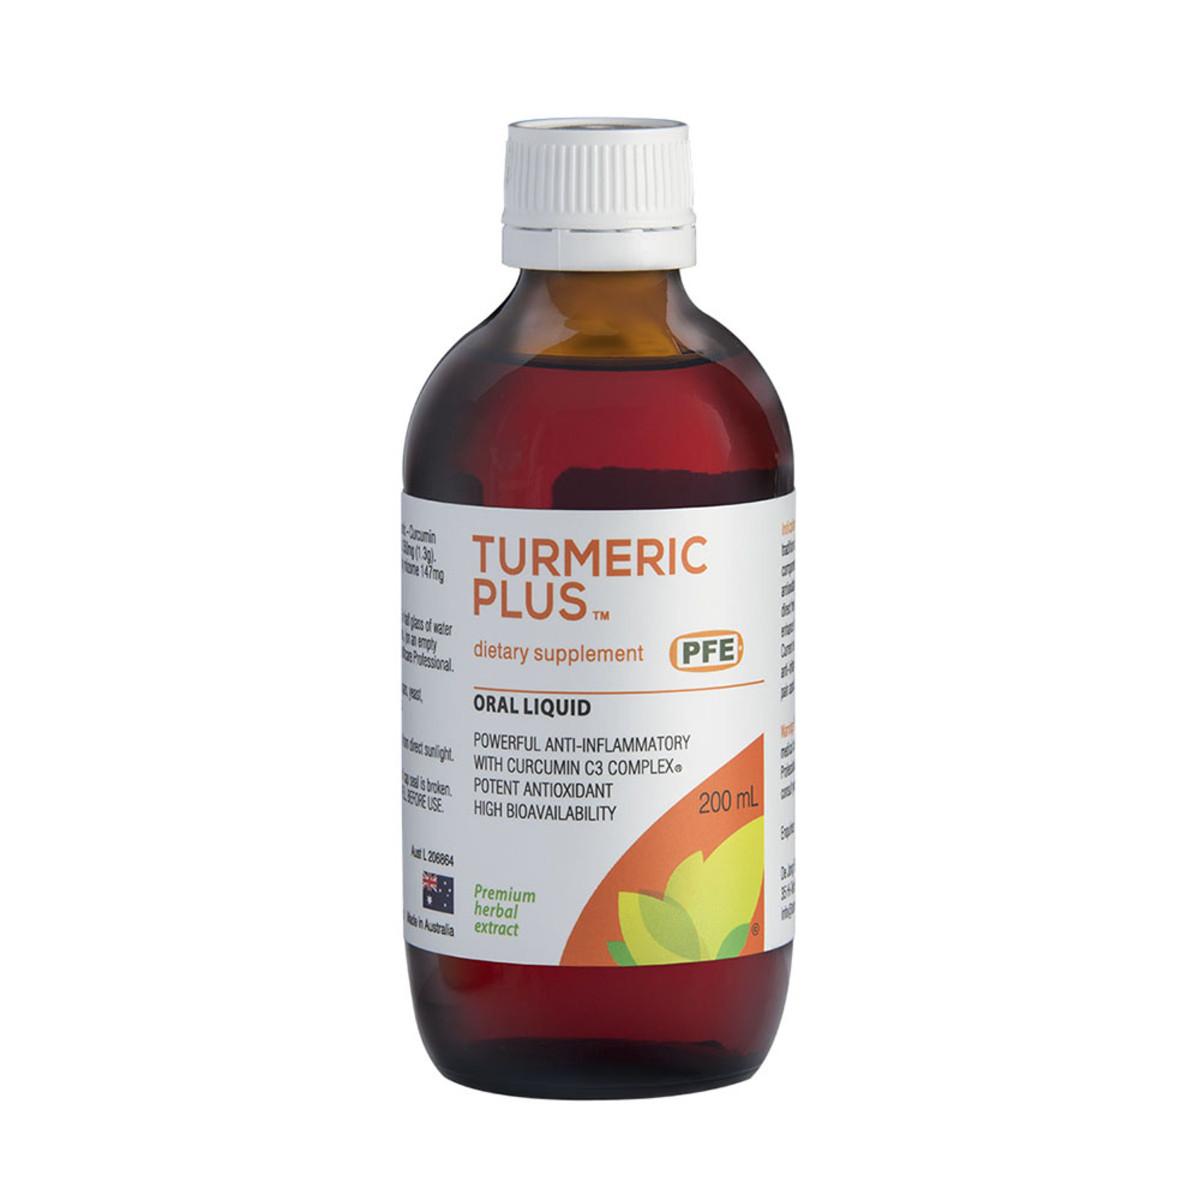 PFE Turmeric Plus Oral Liquid 200ml_media-01